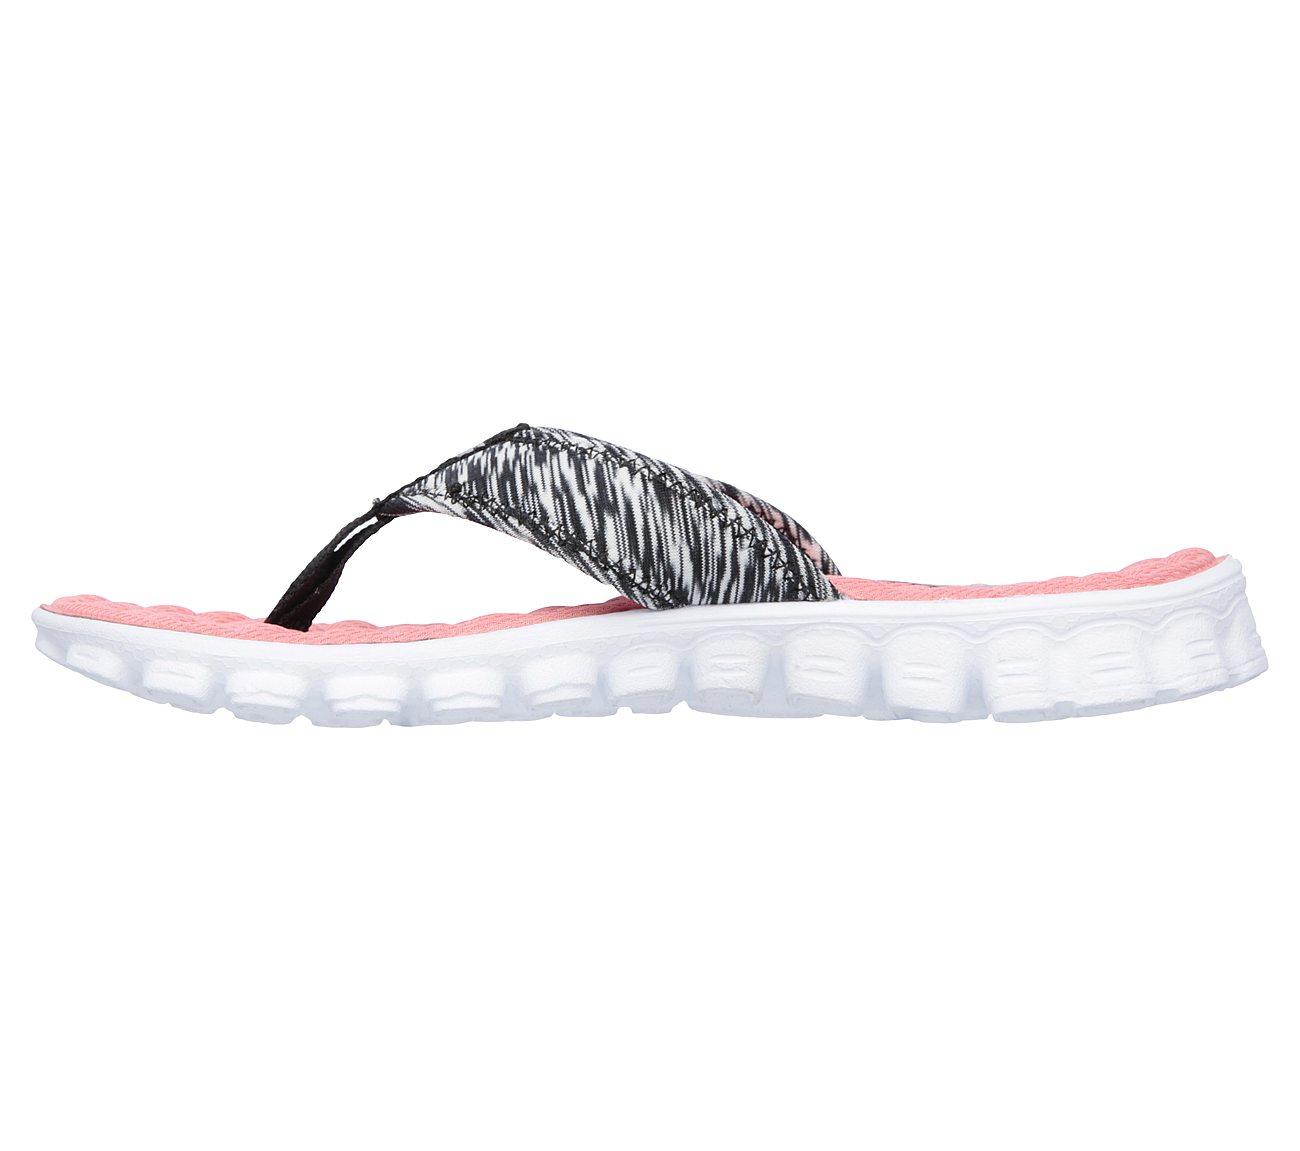 8fa5c420c Buy SKECHERS EZ Flex Cool - Hang Loose Comfort Sandals Shoes only $42.00